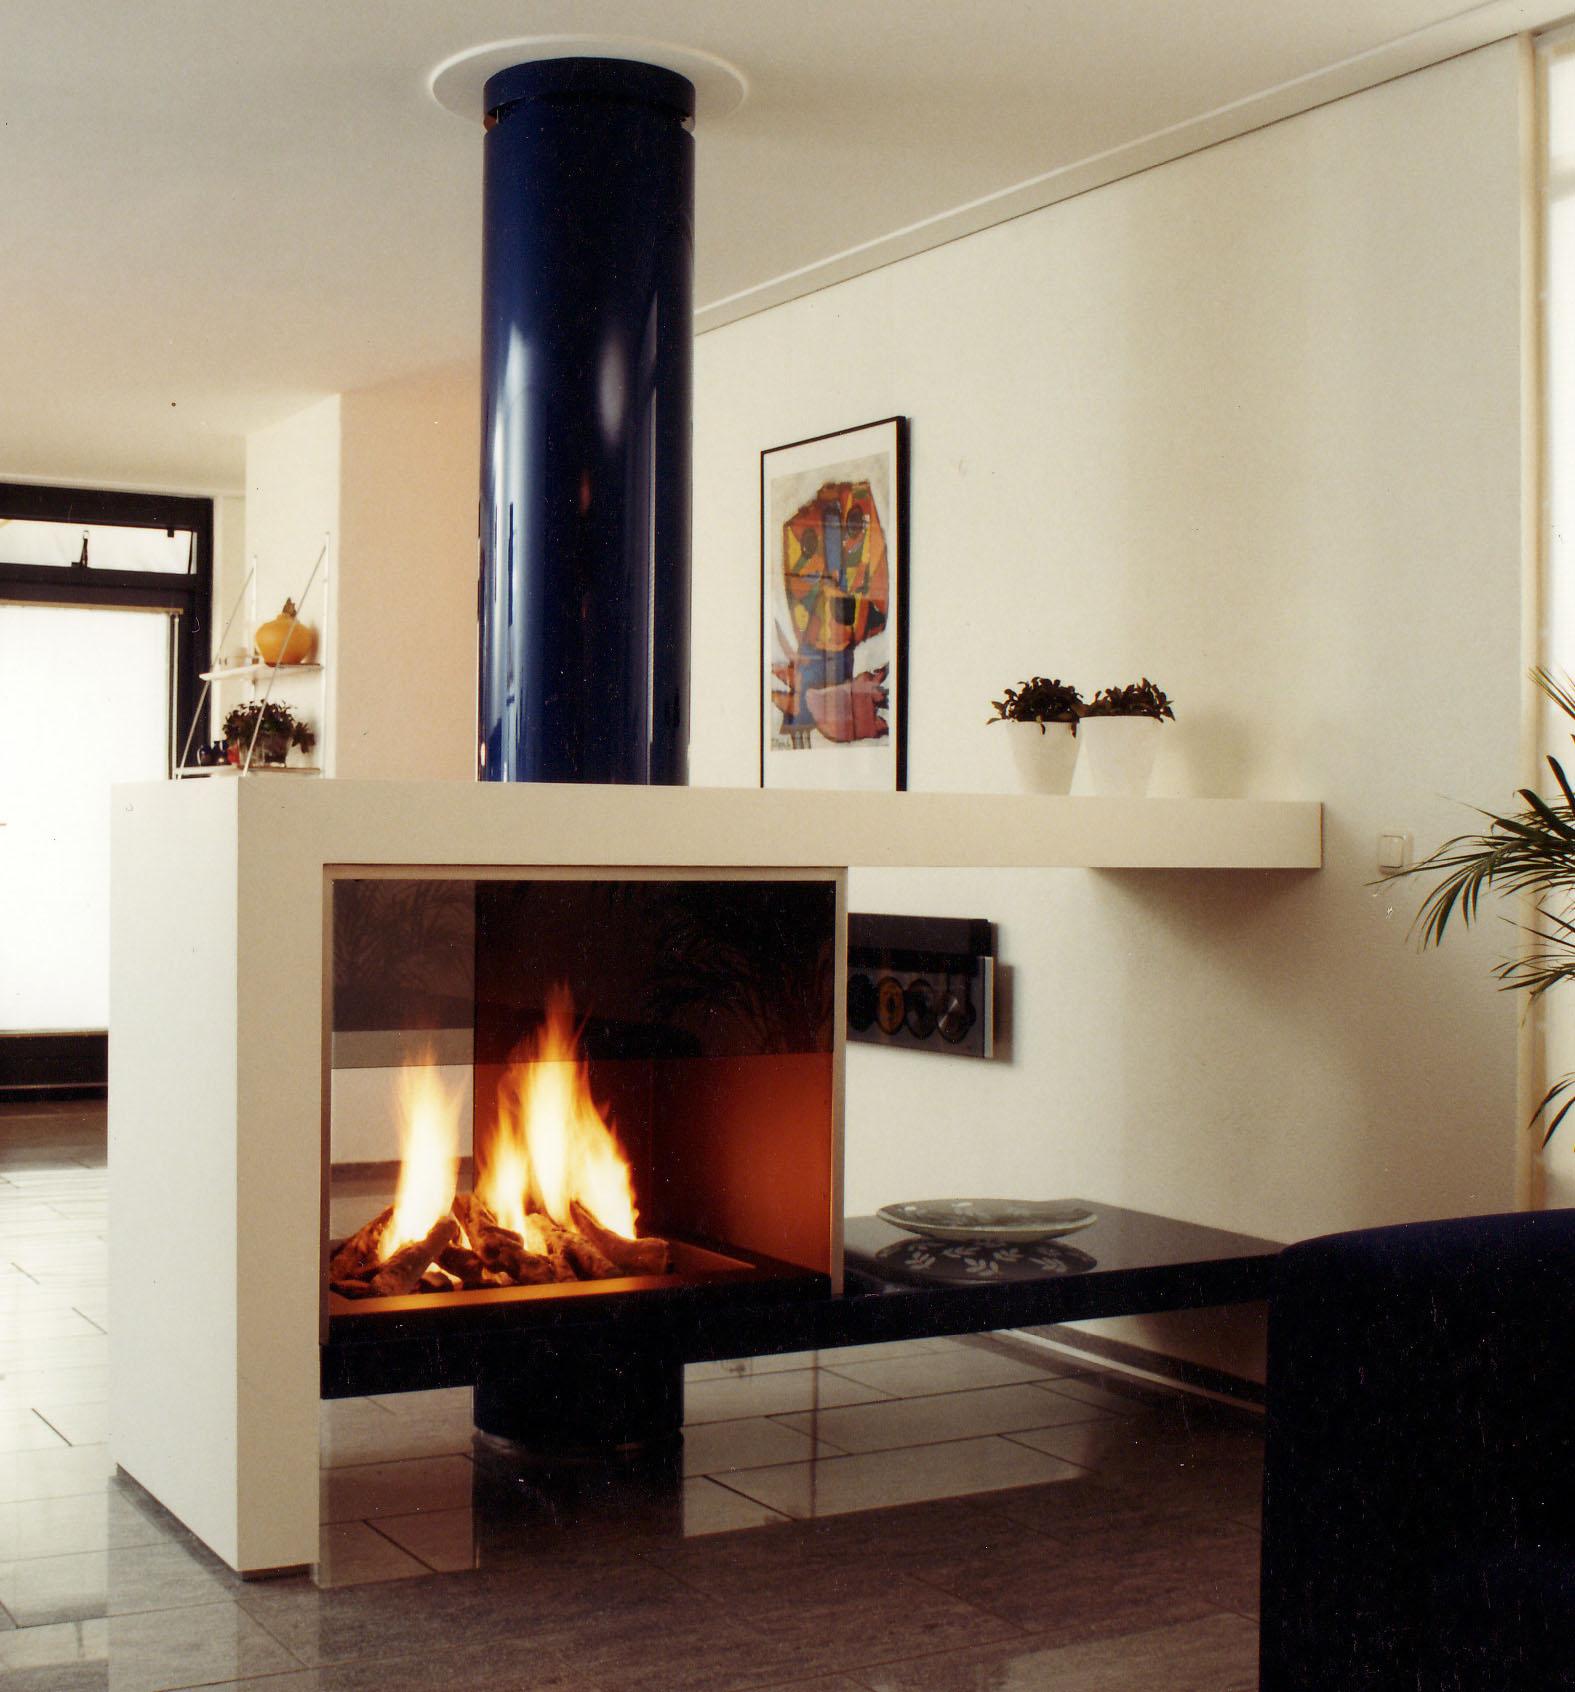 freistehender kamin stehende kamine stehen kamin modernen kamin. Black Bedroom Furniture Sets. Home Design Ideas